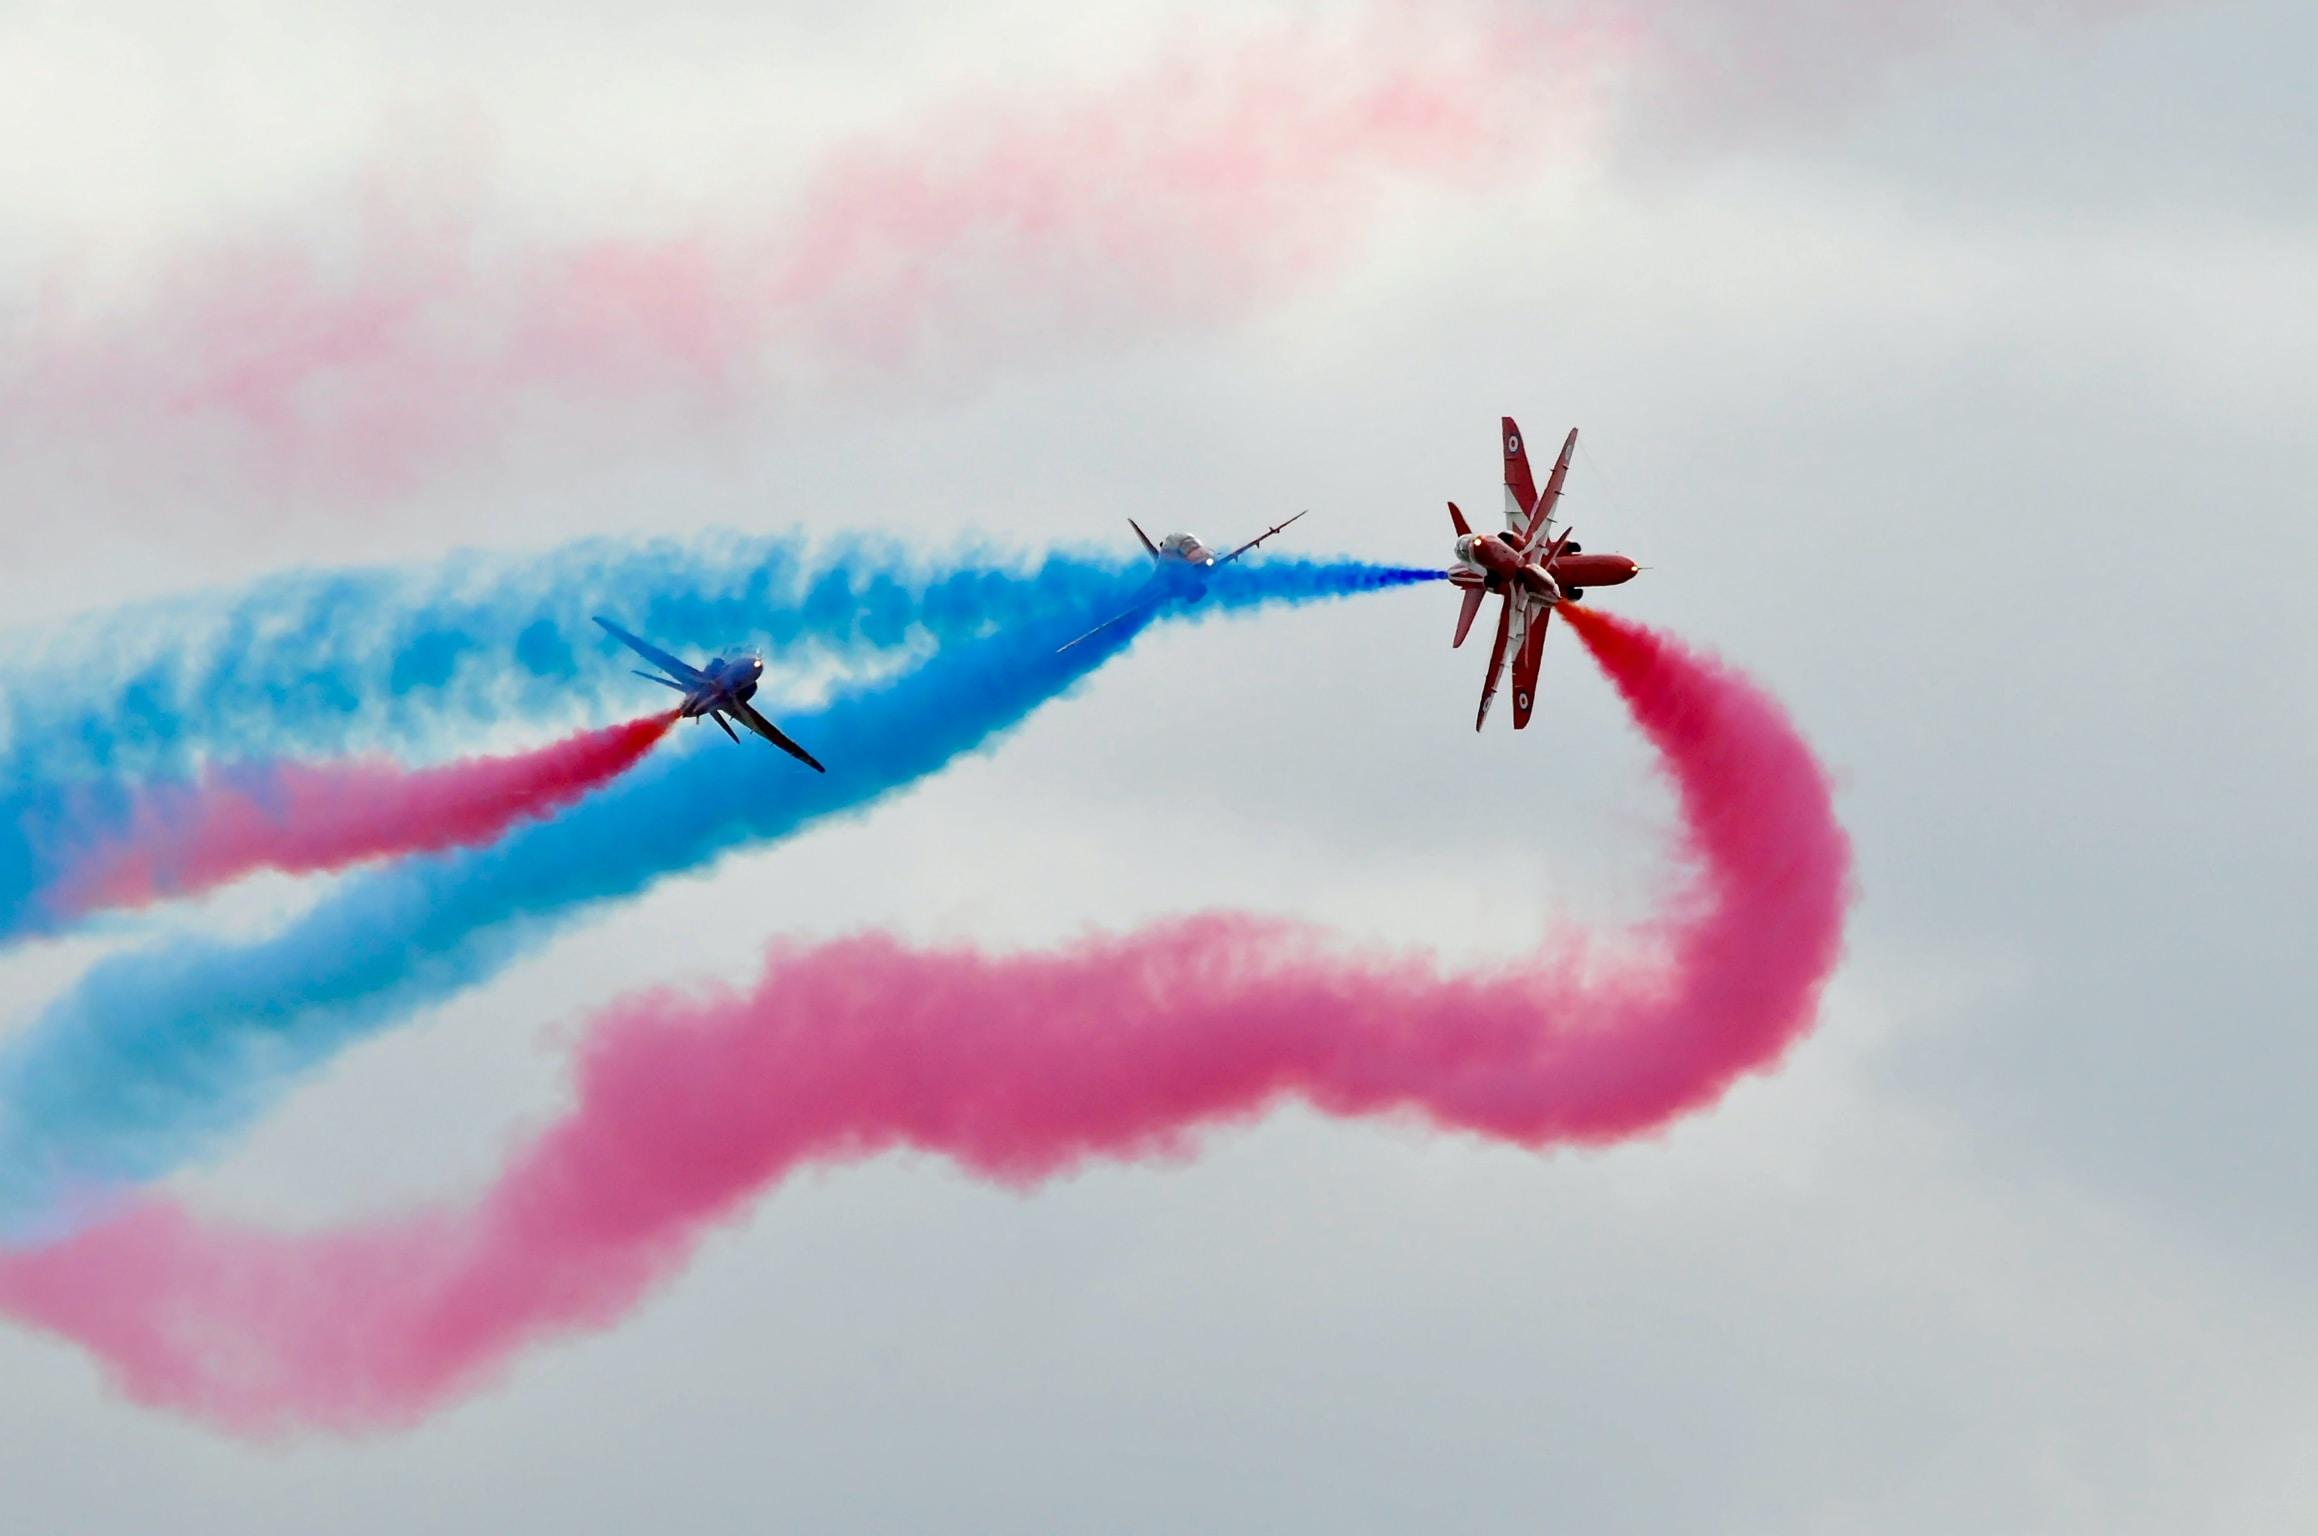 three planes doing aerobatics